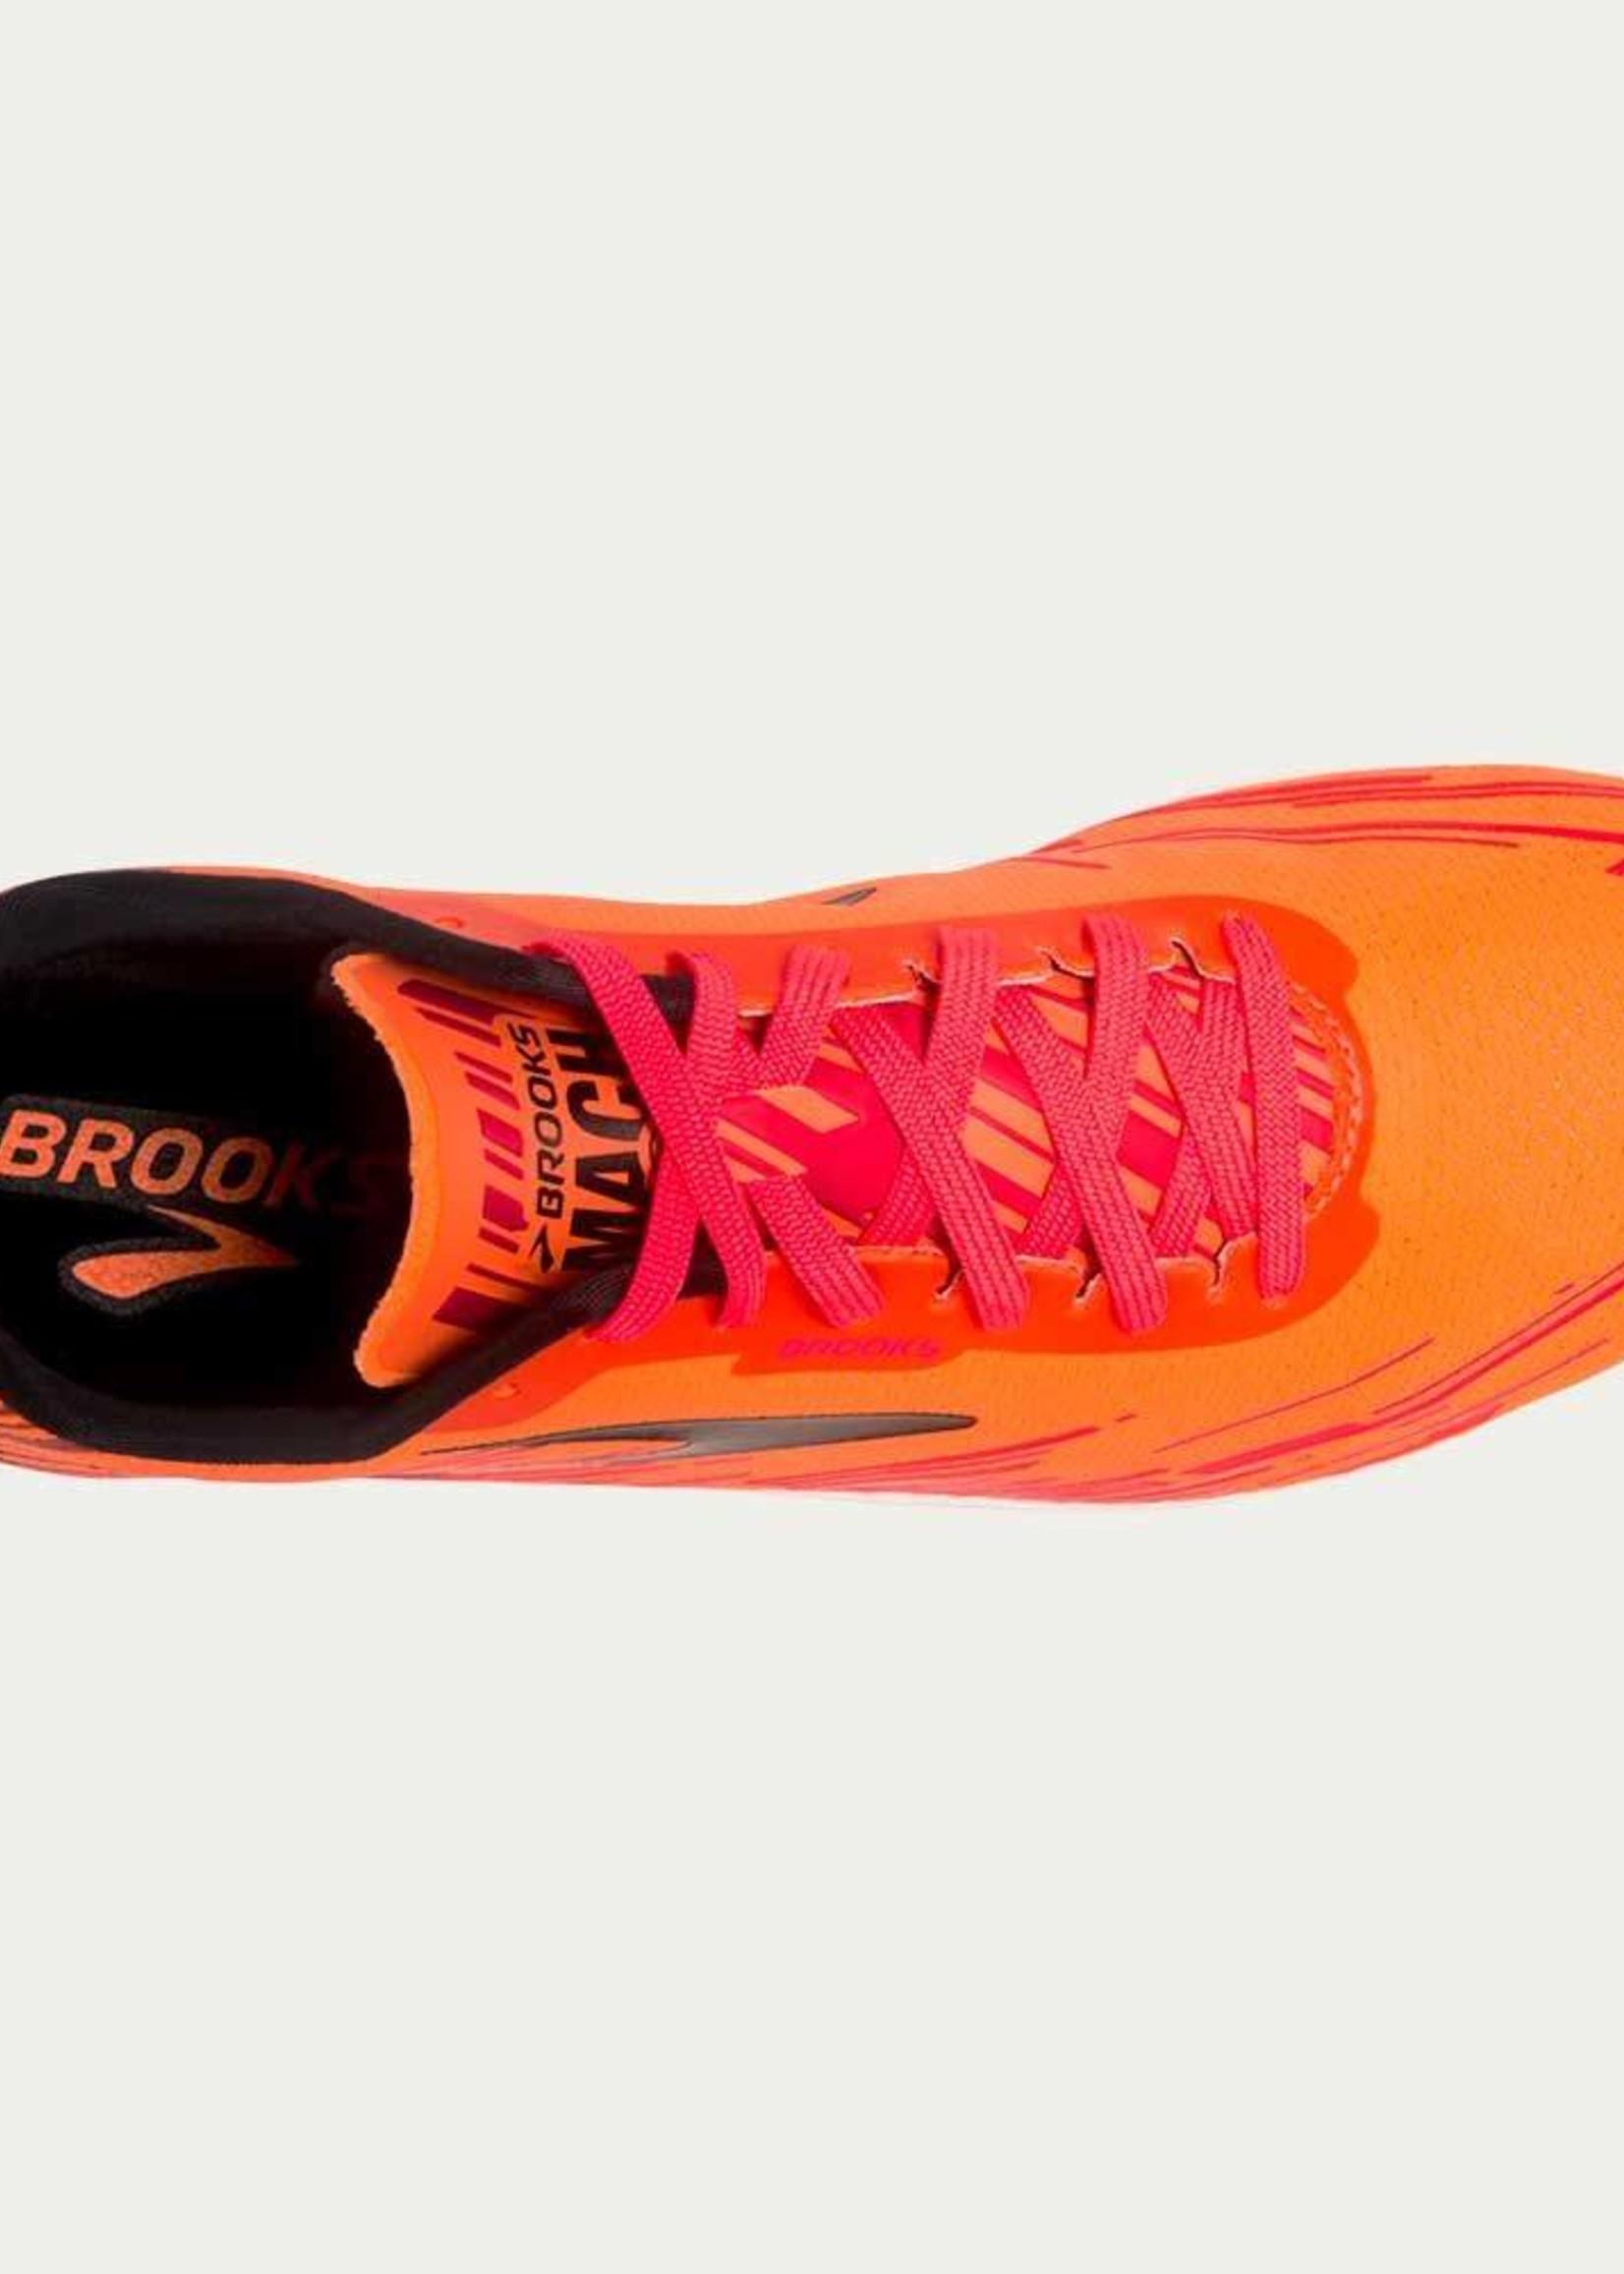 Brooks Brooks Mach 18 - Mens